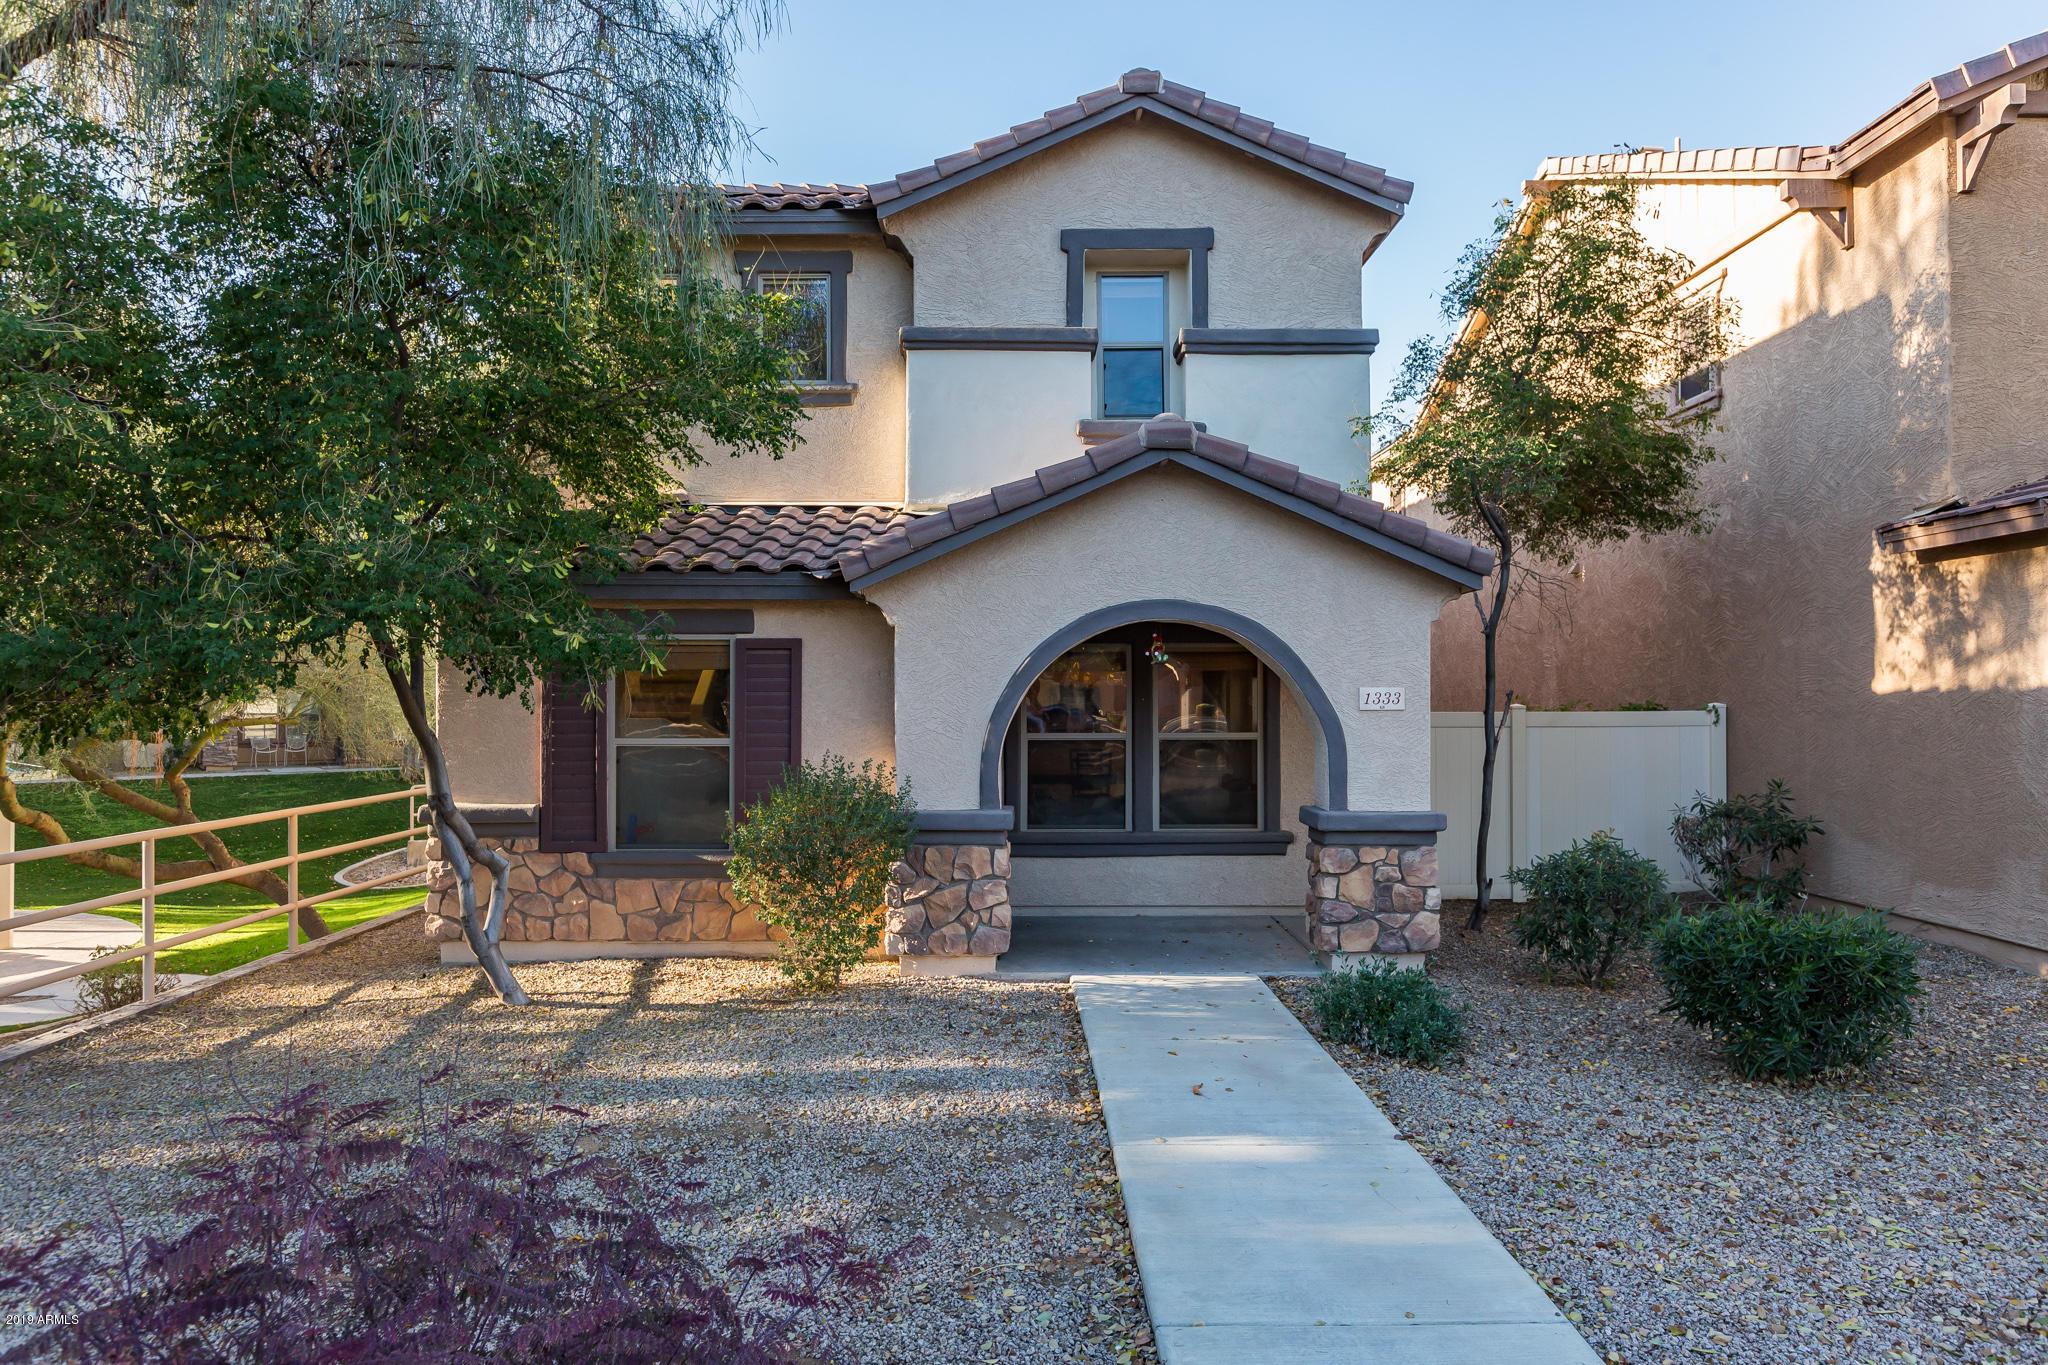 MLS 5872061 1333 S SUNVIEW --, Mesa, AZ 85206 Mesa AZ Summerlin Village